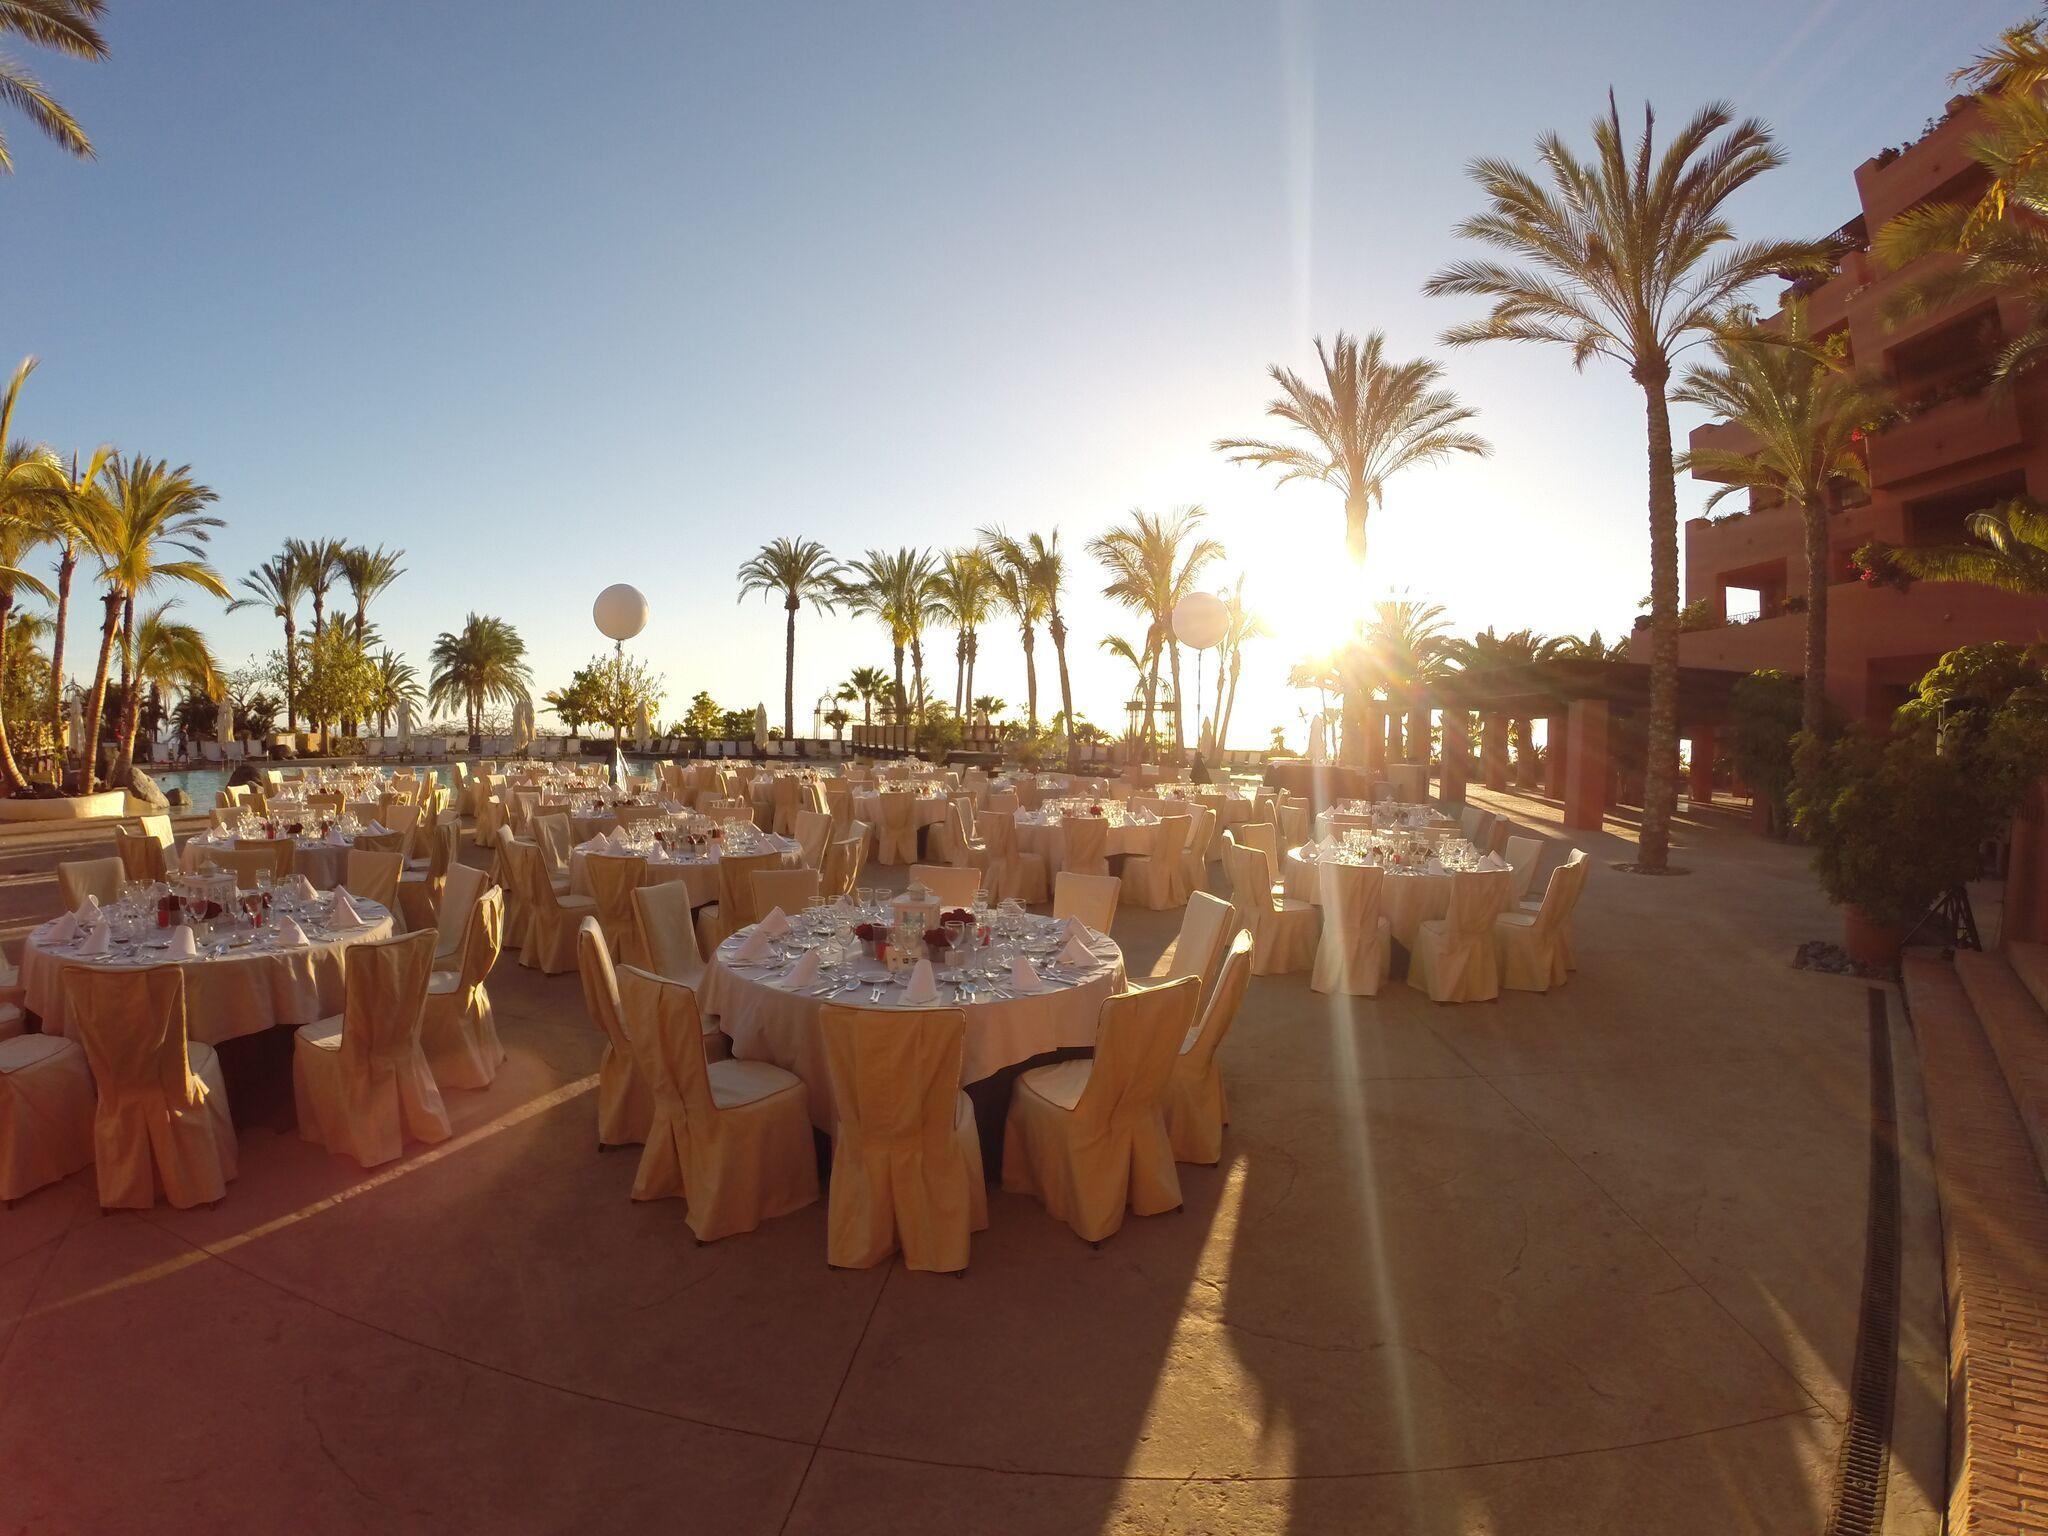 Banquete Exterior Piscina